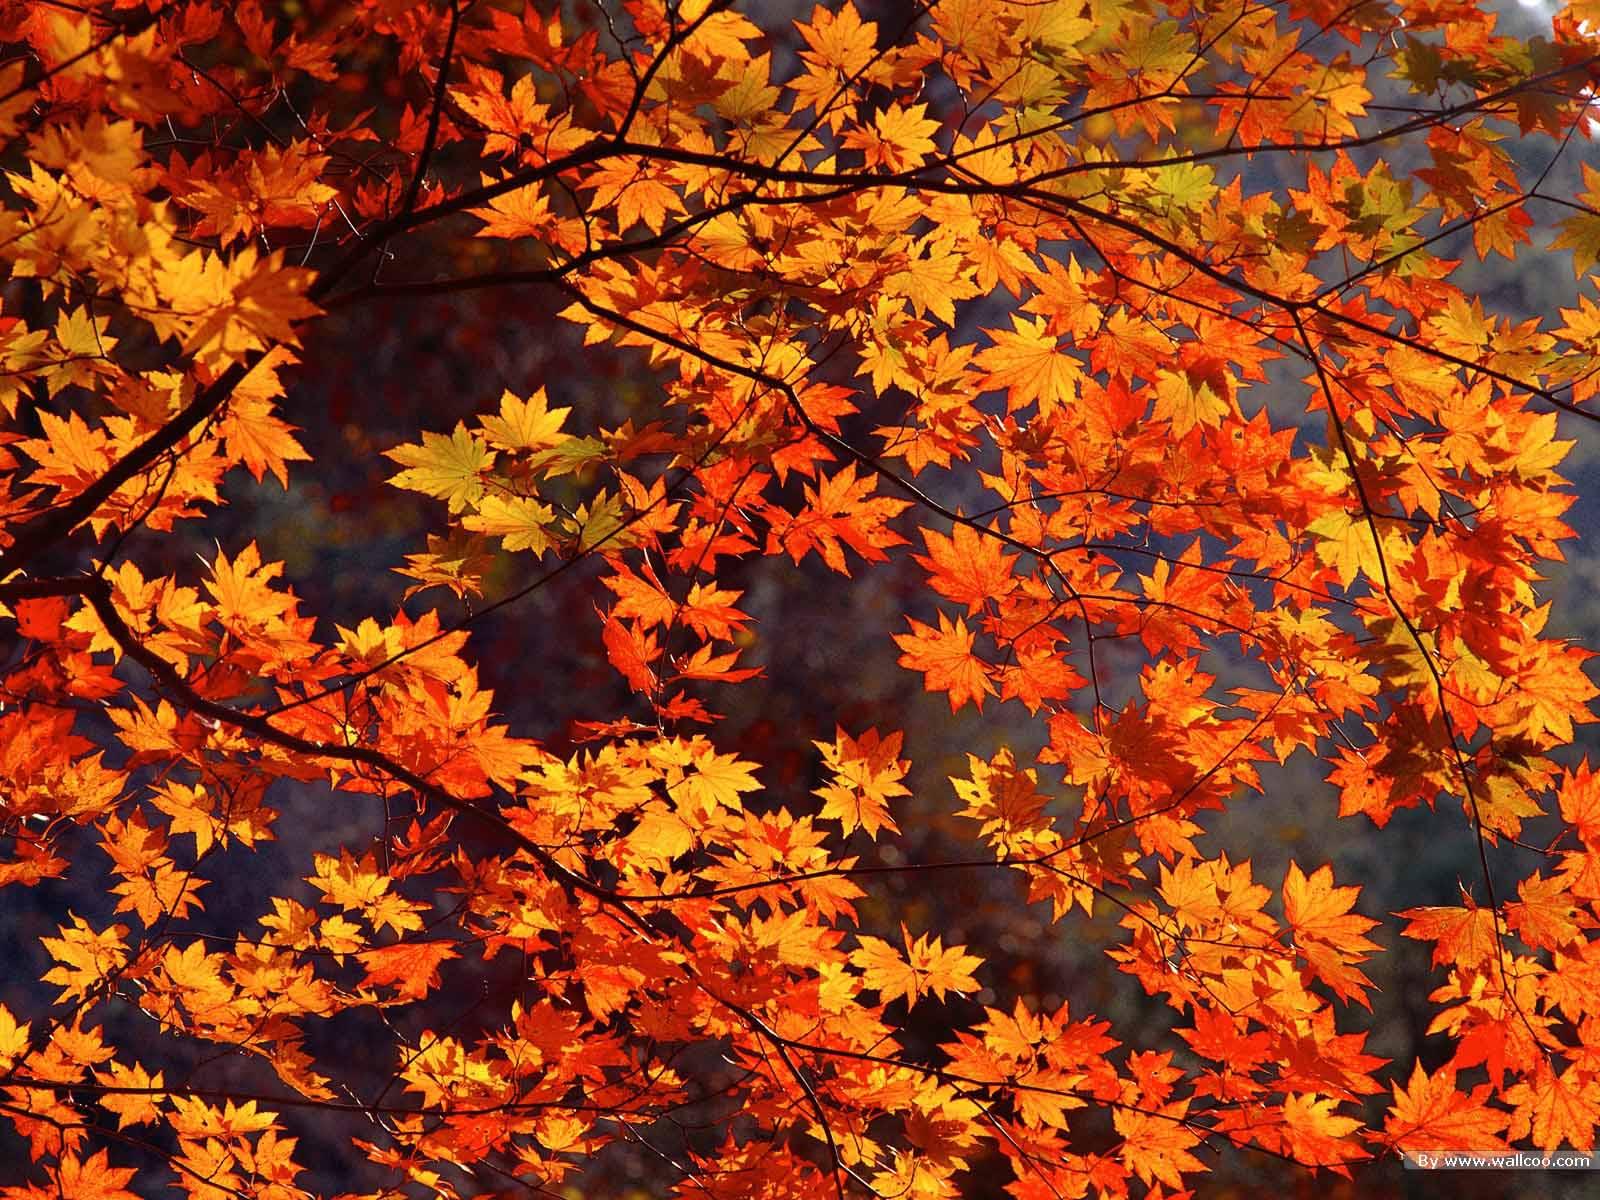 Autumn Leaves Live Wallpaper   Fall Computer Wallpaper 1600x1200